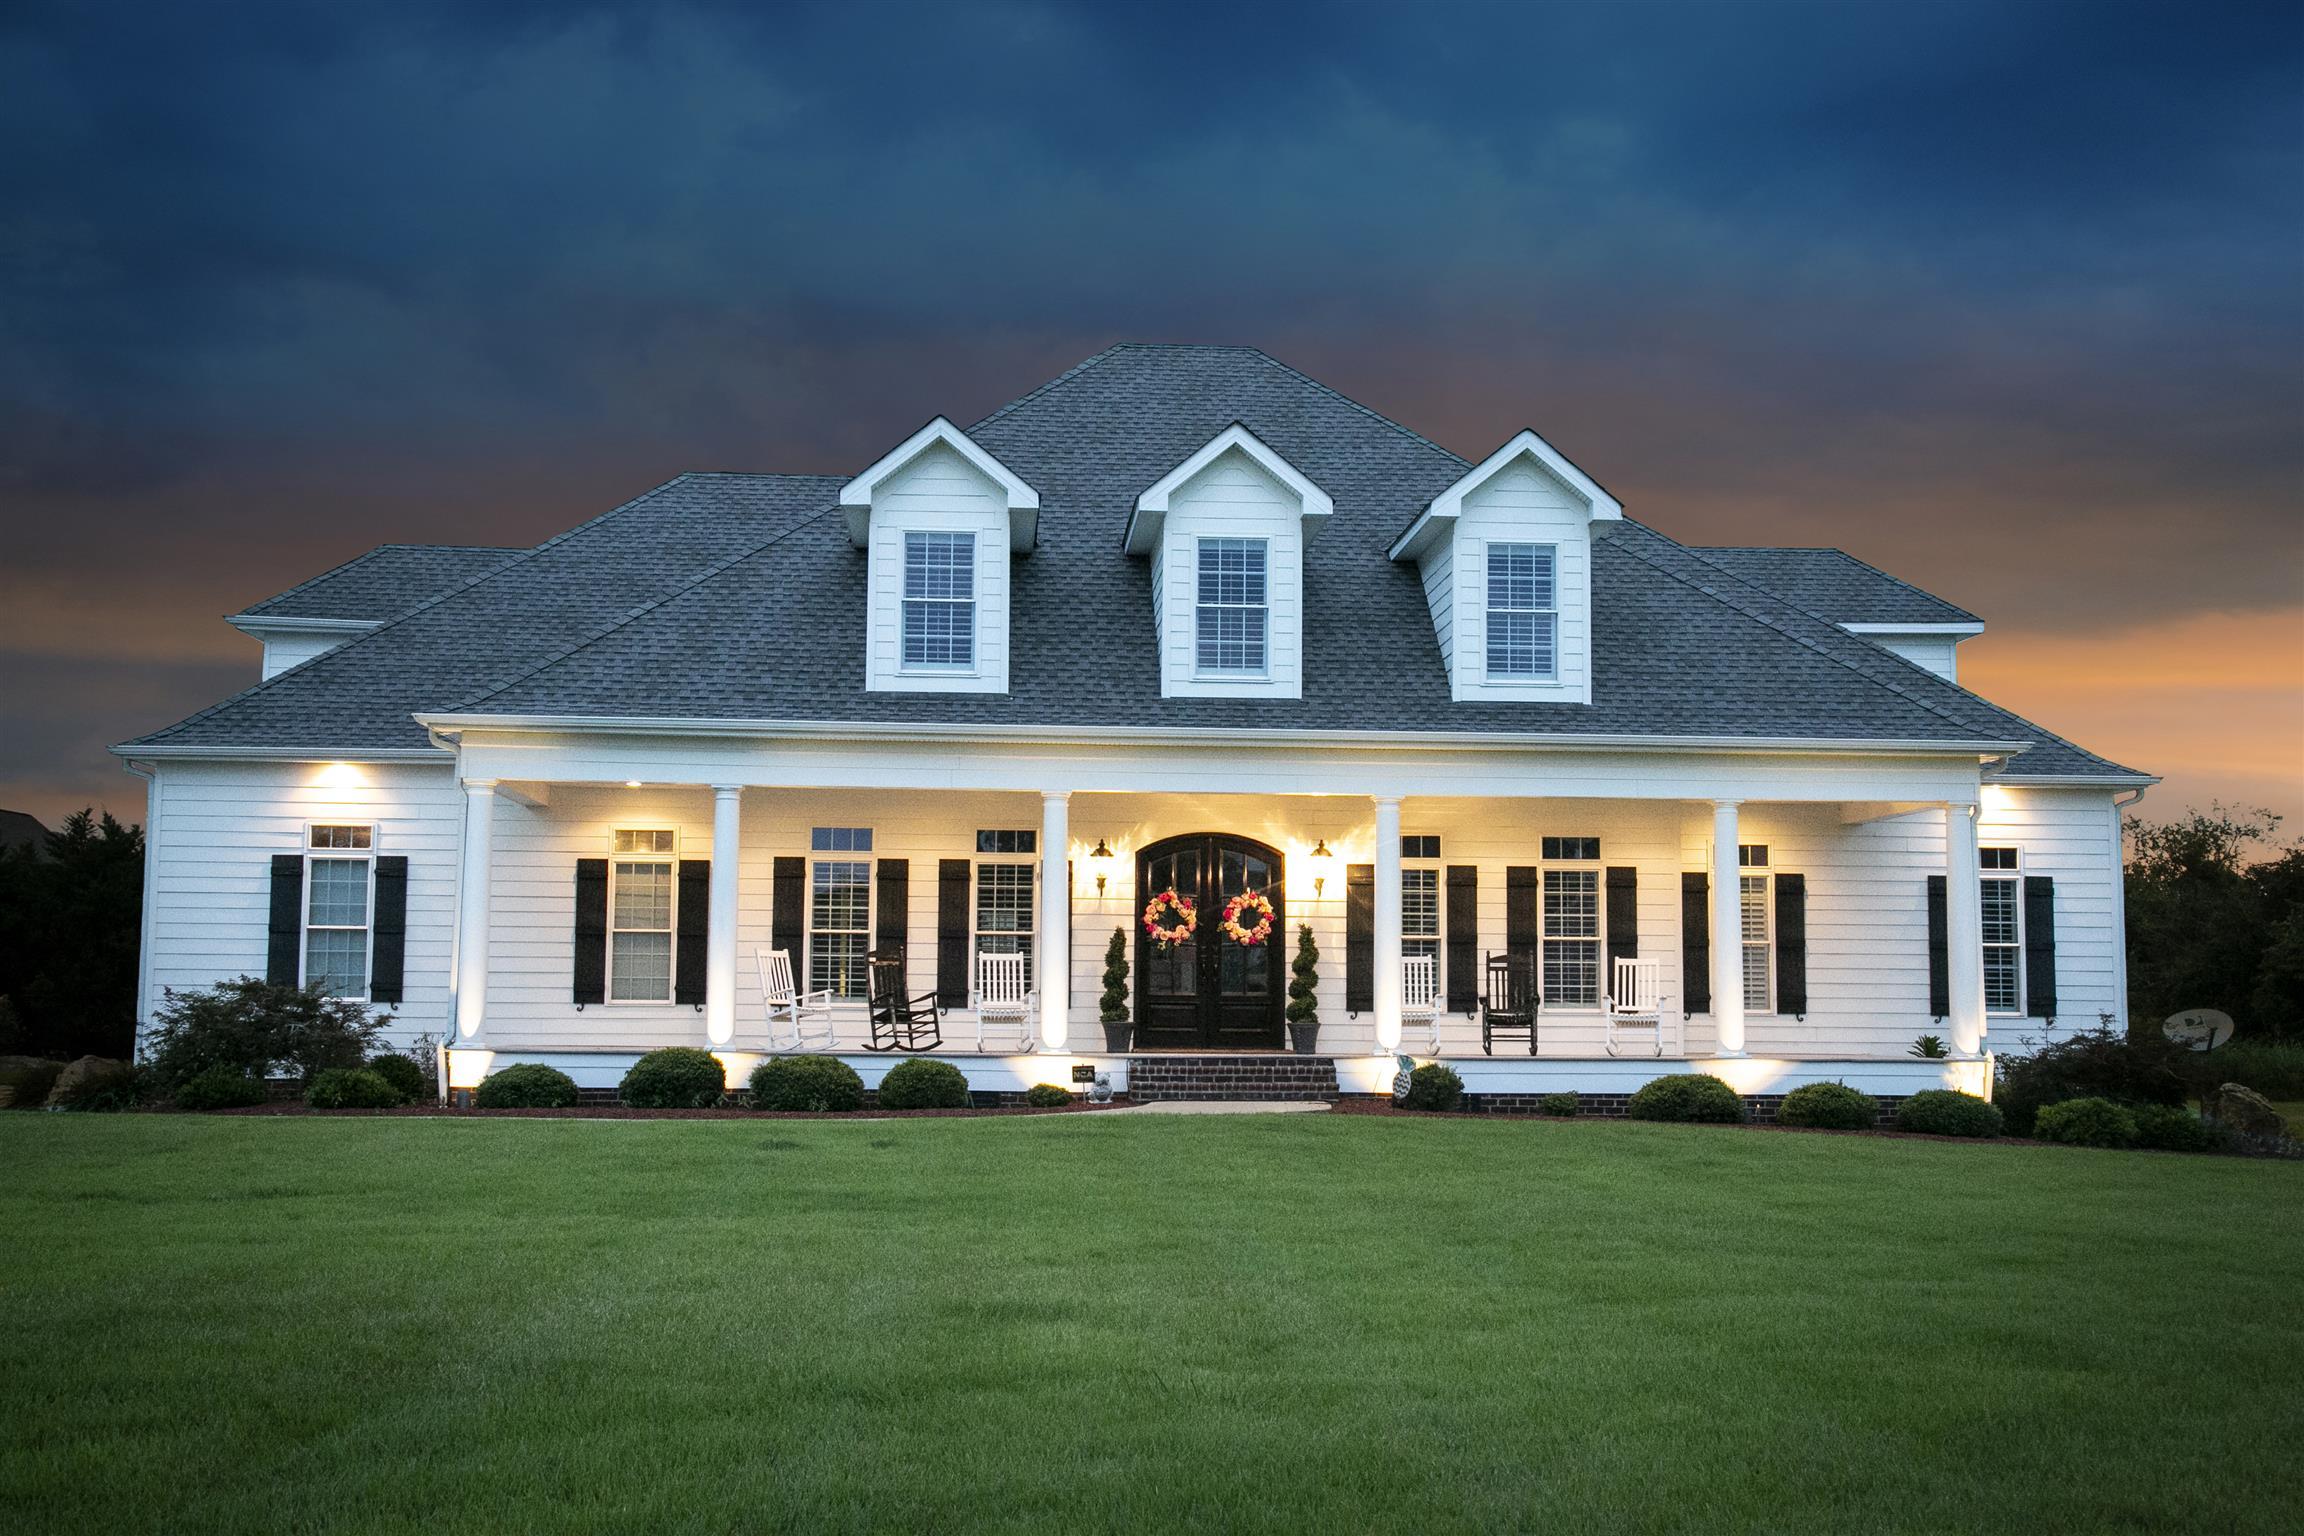 106 Fox Den Way, Murfreesboro, TN 37130 - Murfreesboro, TN real estate listing